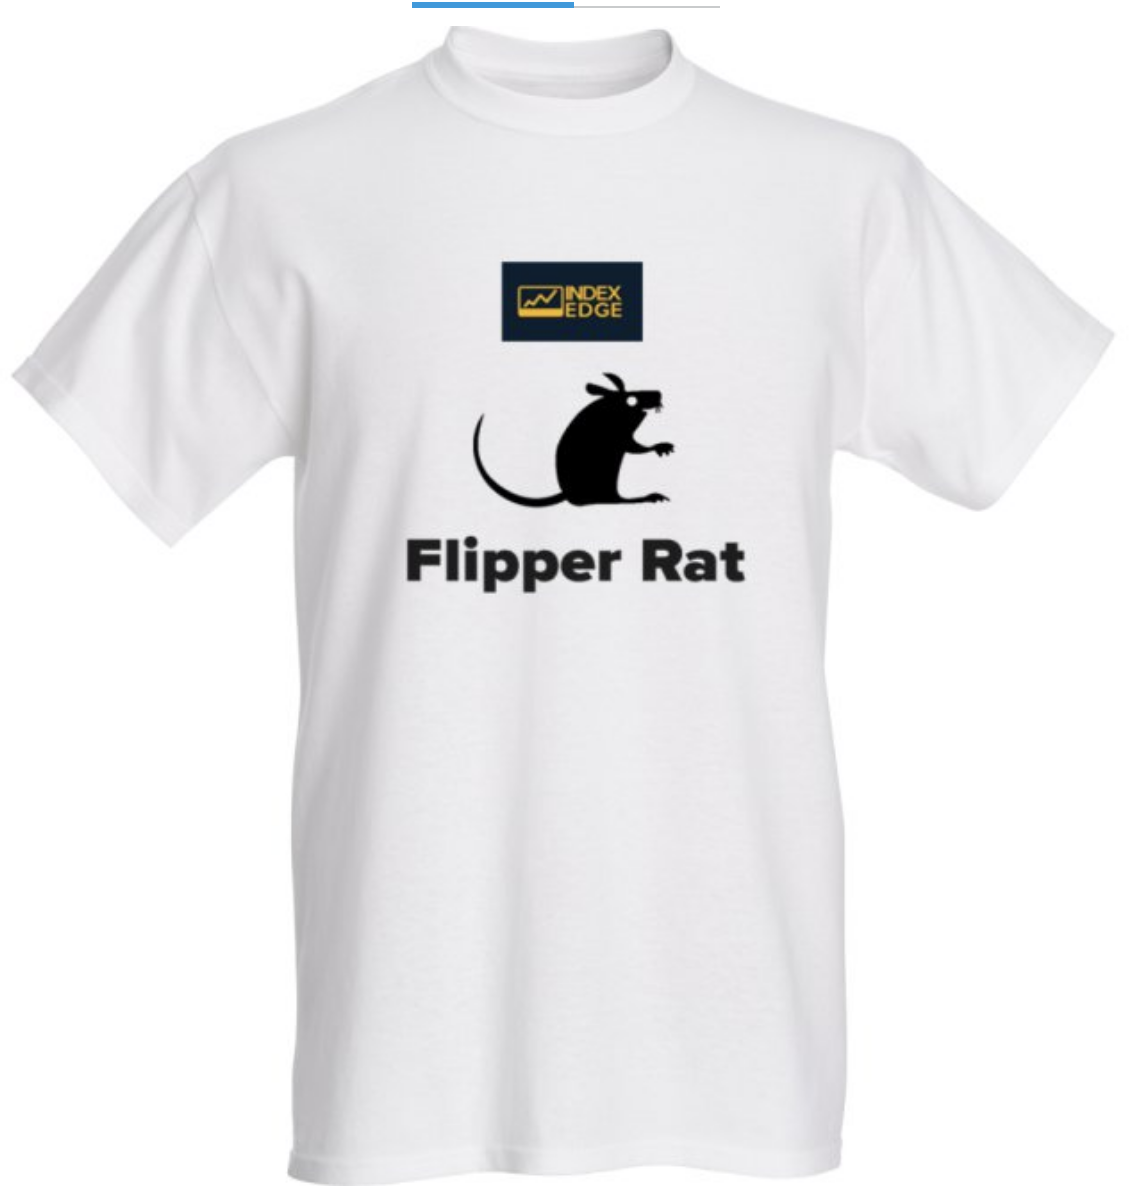 2. Flipper Rat (Large only)